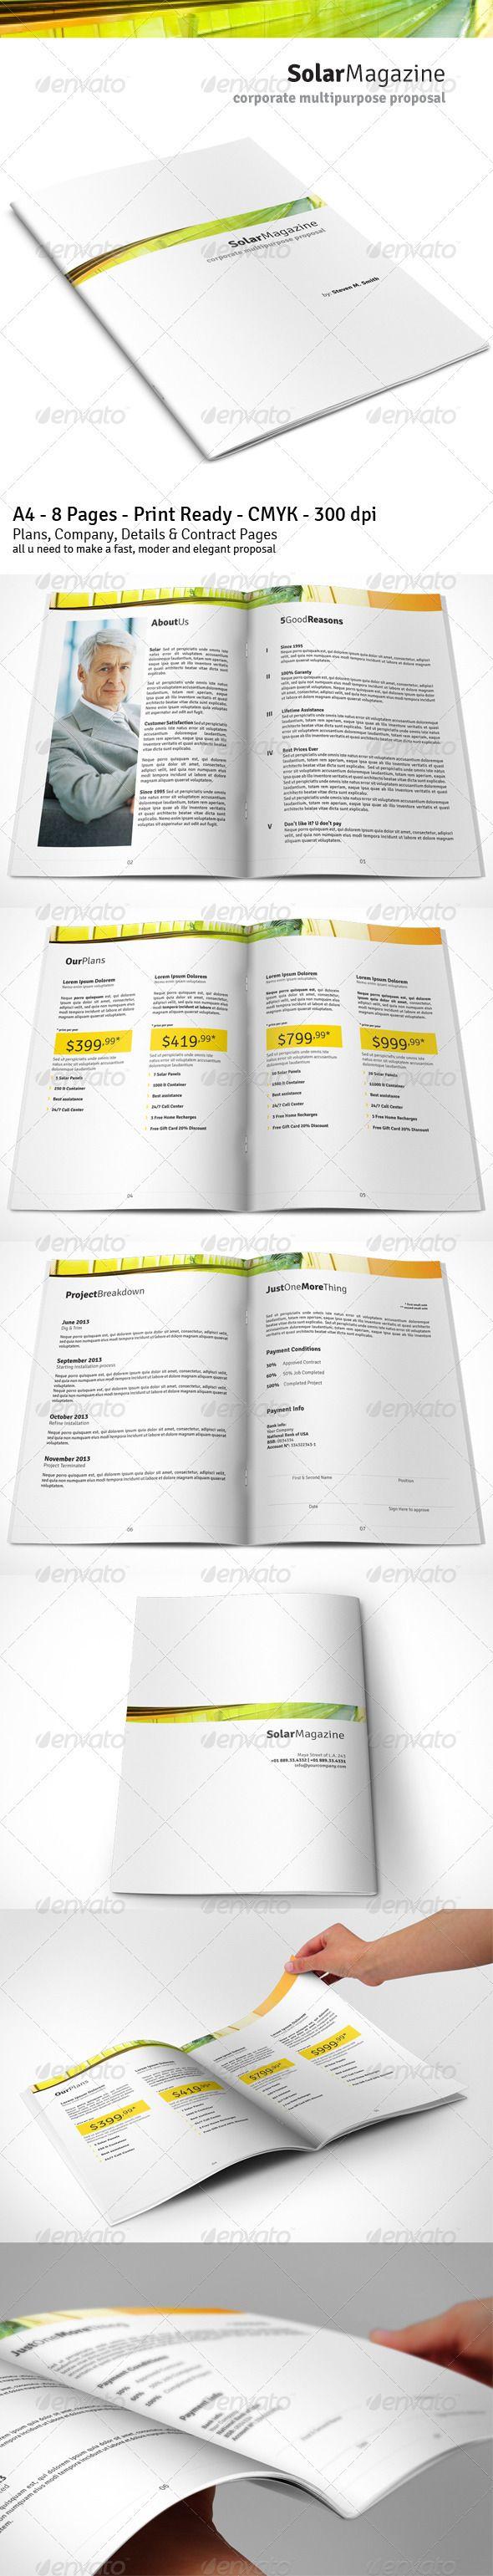 17 best ideas about Sales Proposal on Pinterest   Report design ...